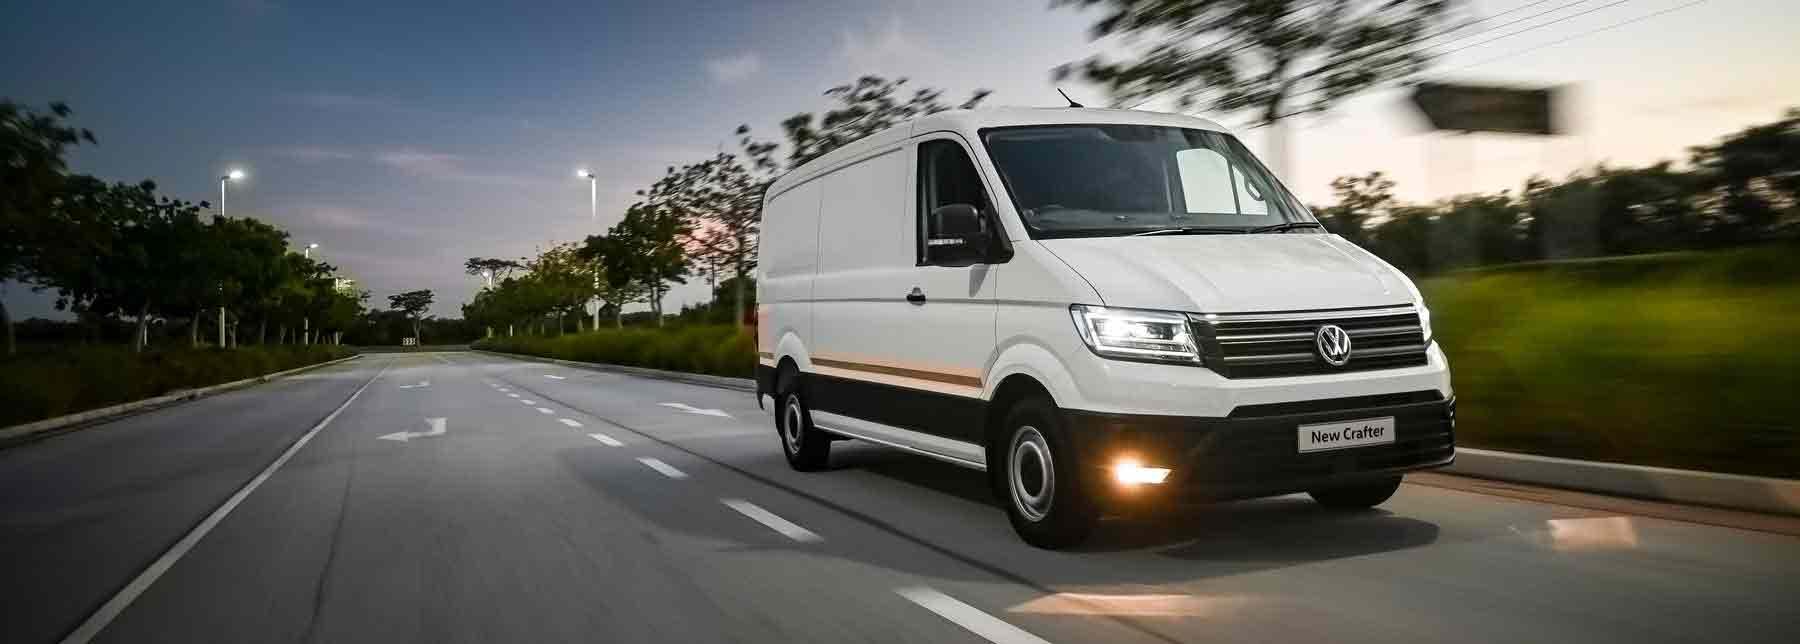 Volkswagen expands Crafter 35 model range